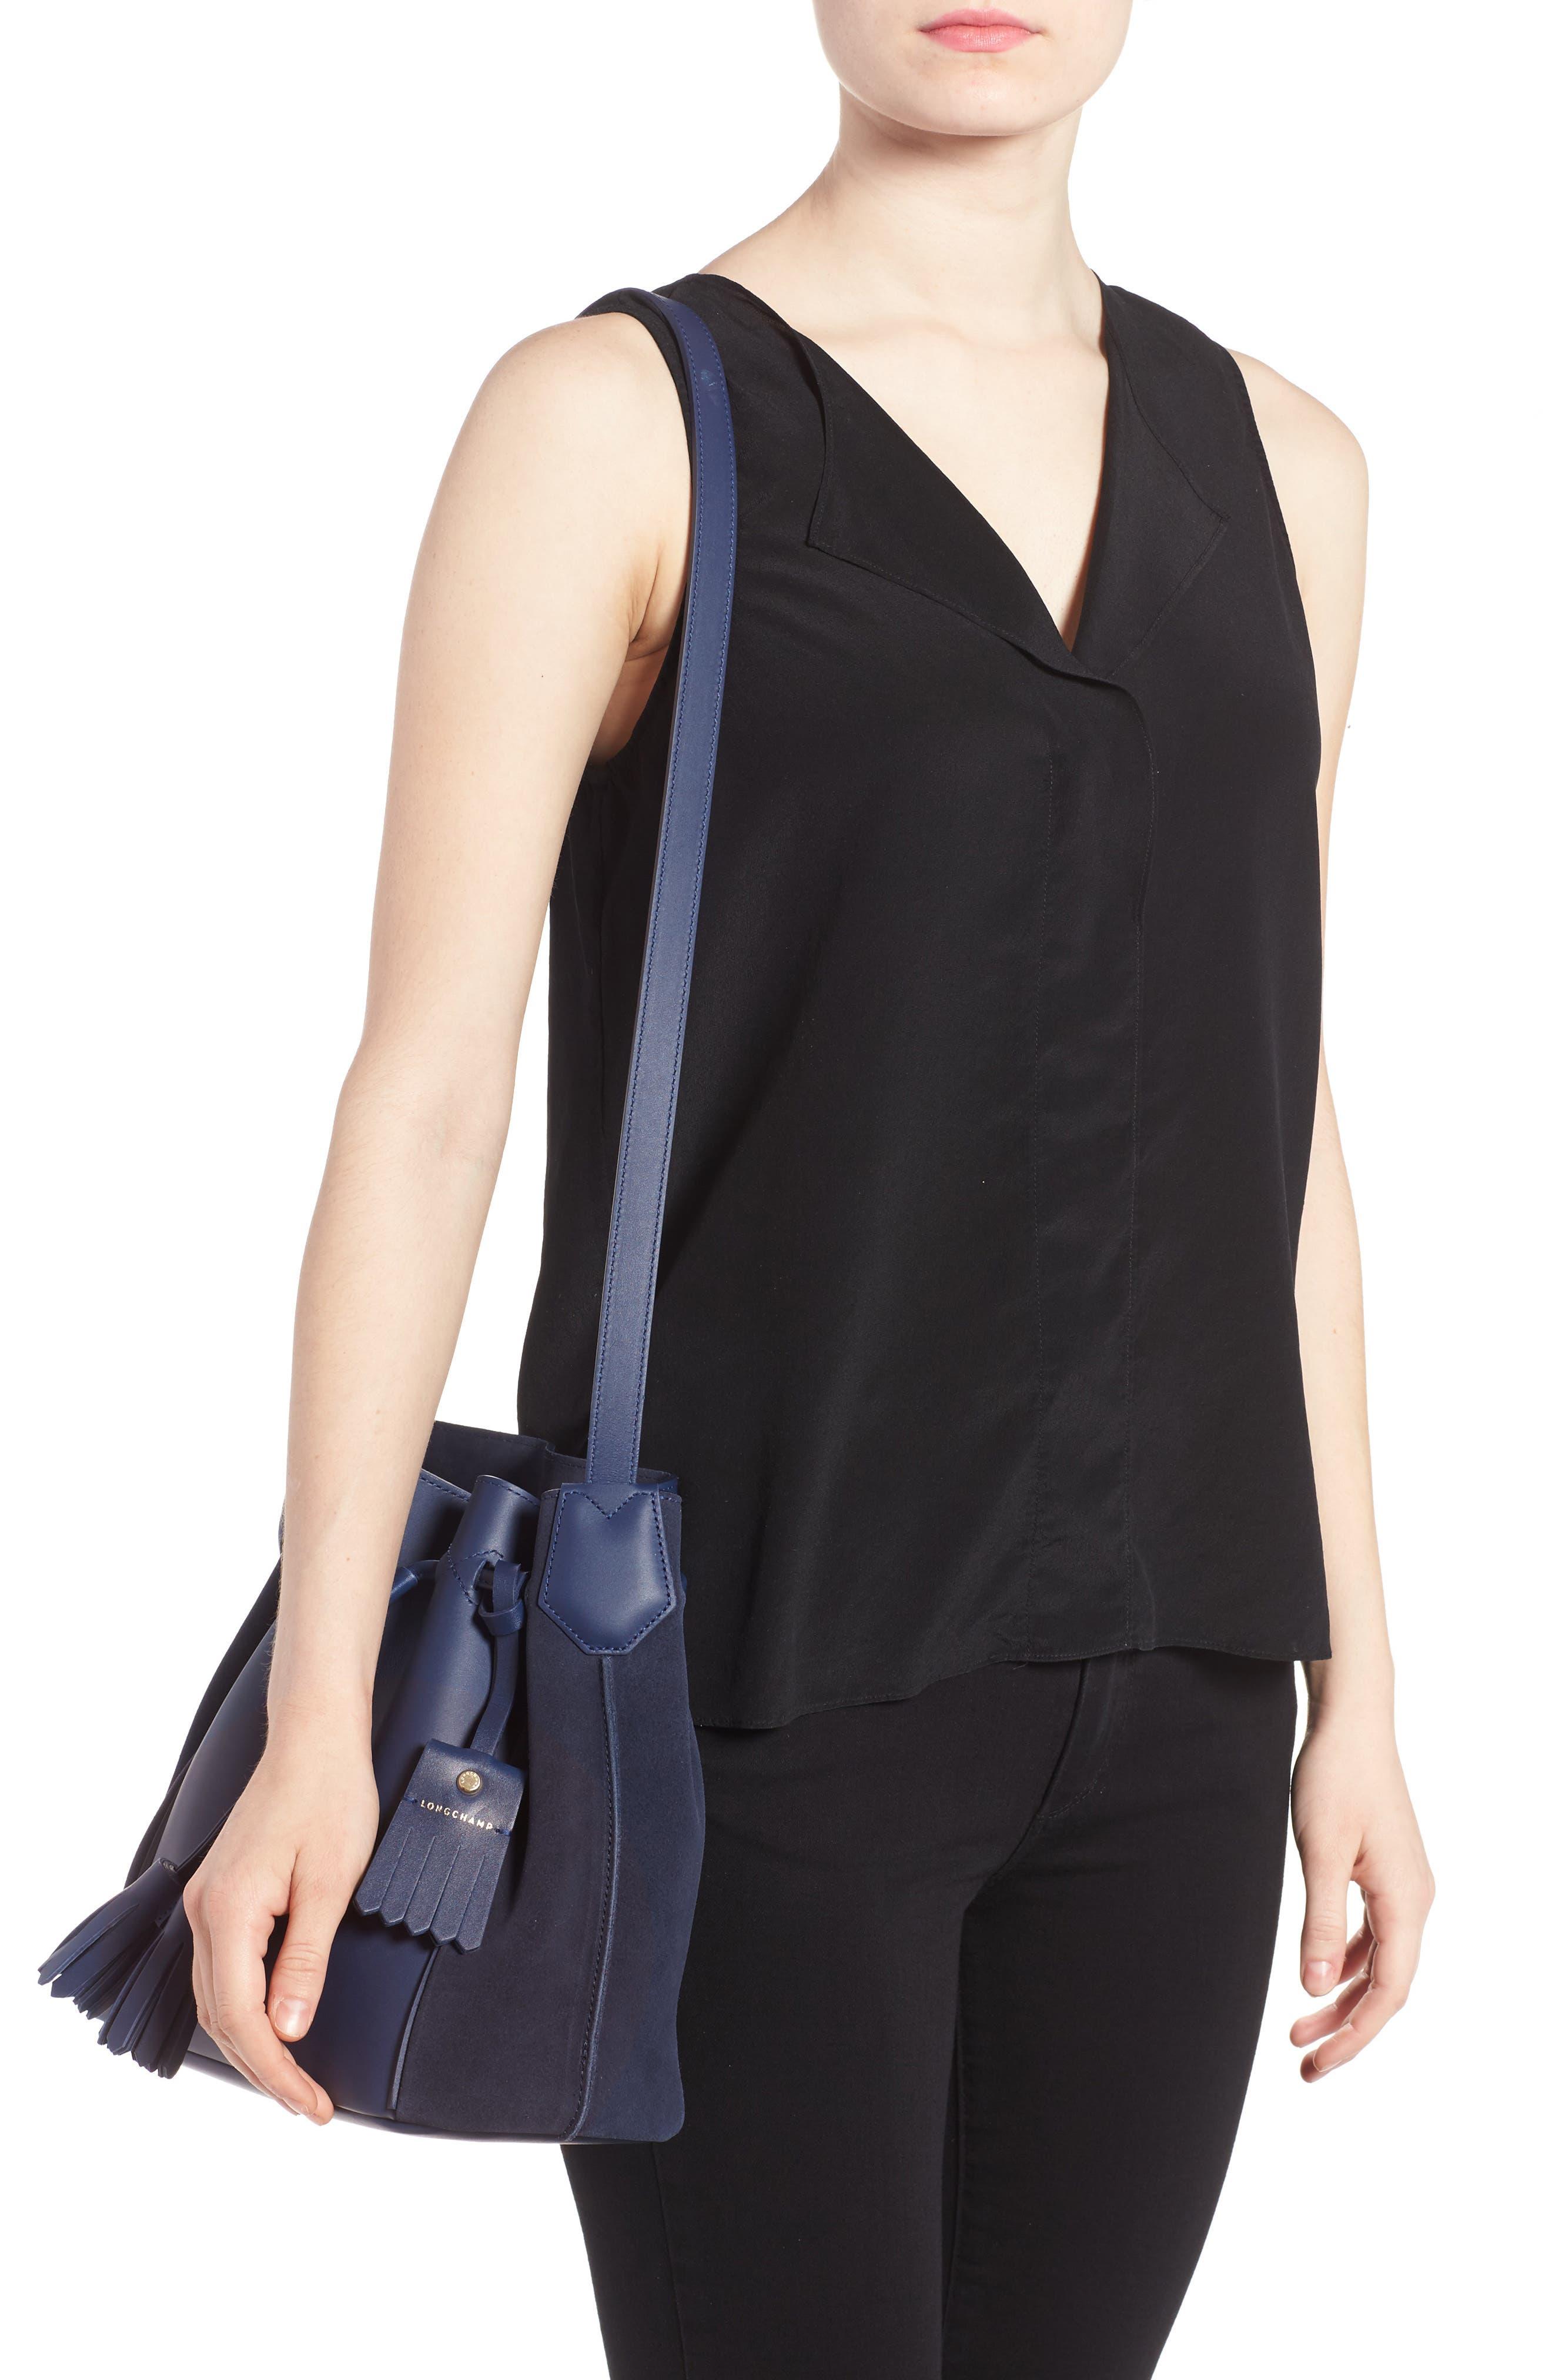 Penelope Fantasie Leather Bucket Bag,                             Alternate thumbnail 5, color,